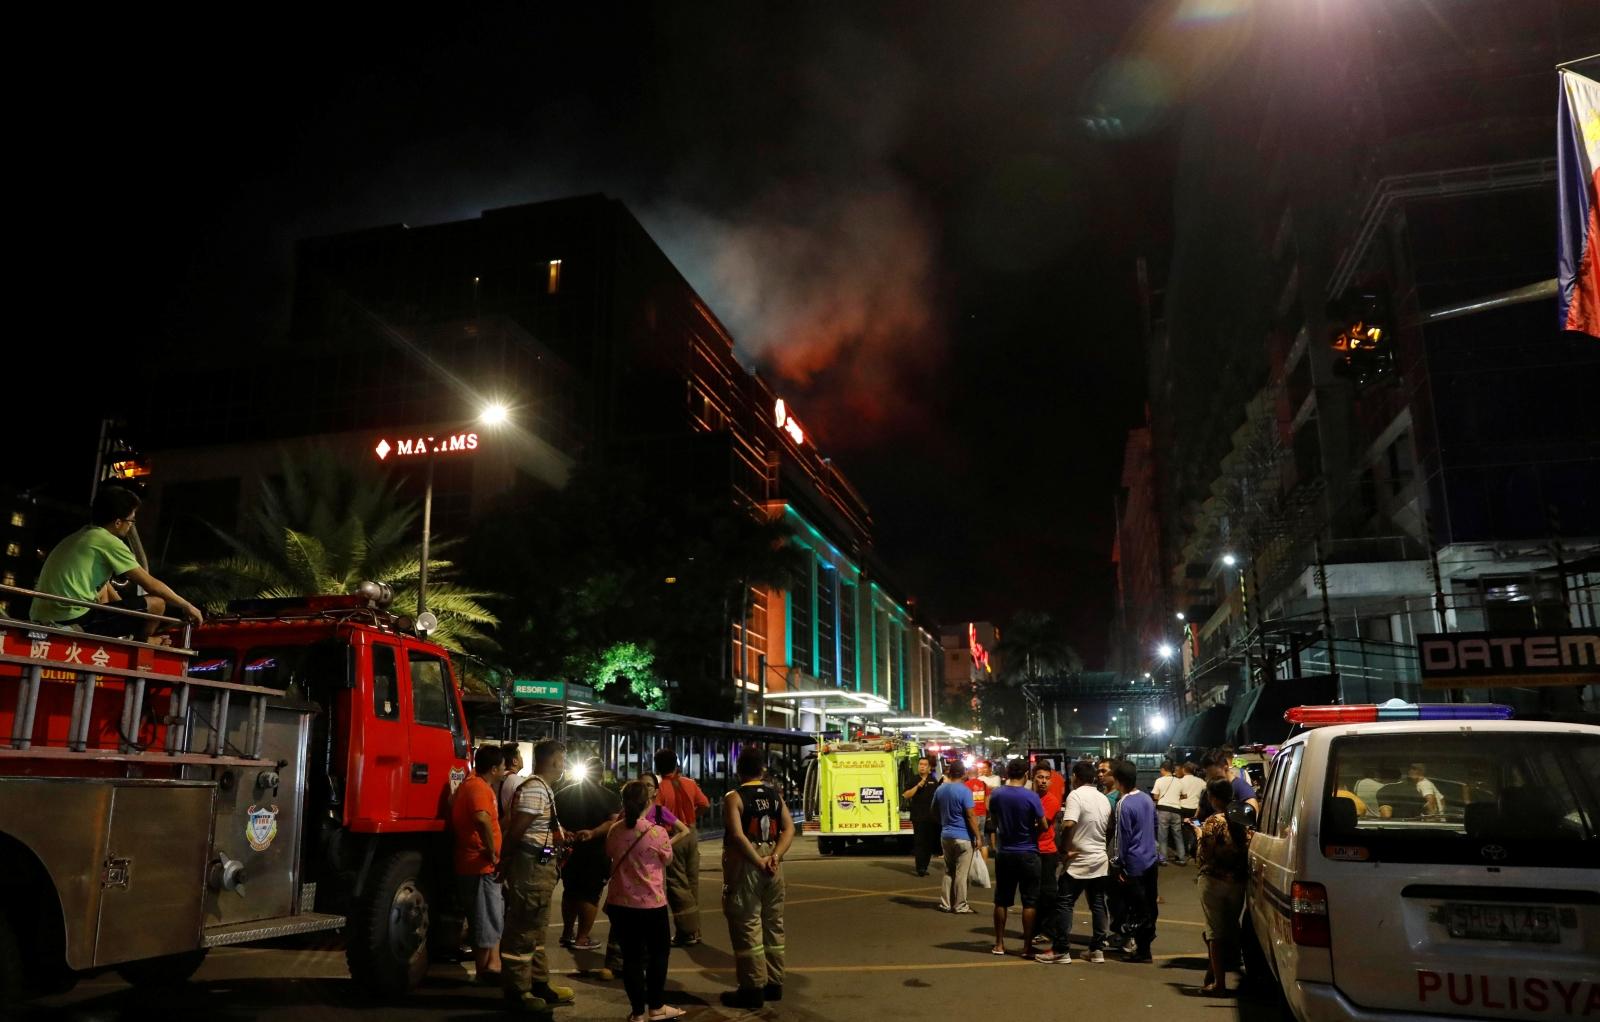 manila-casino-attack-lone-gunman-kills-more-than-30-people-in-philippines